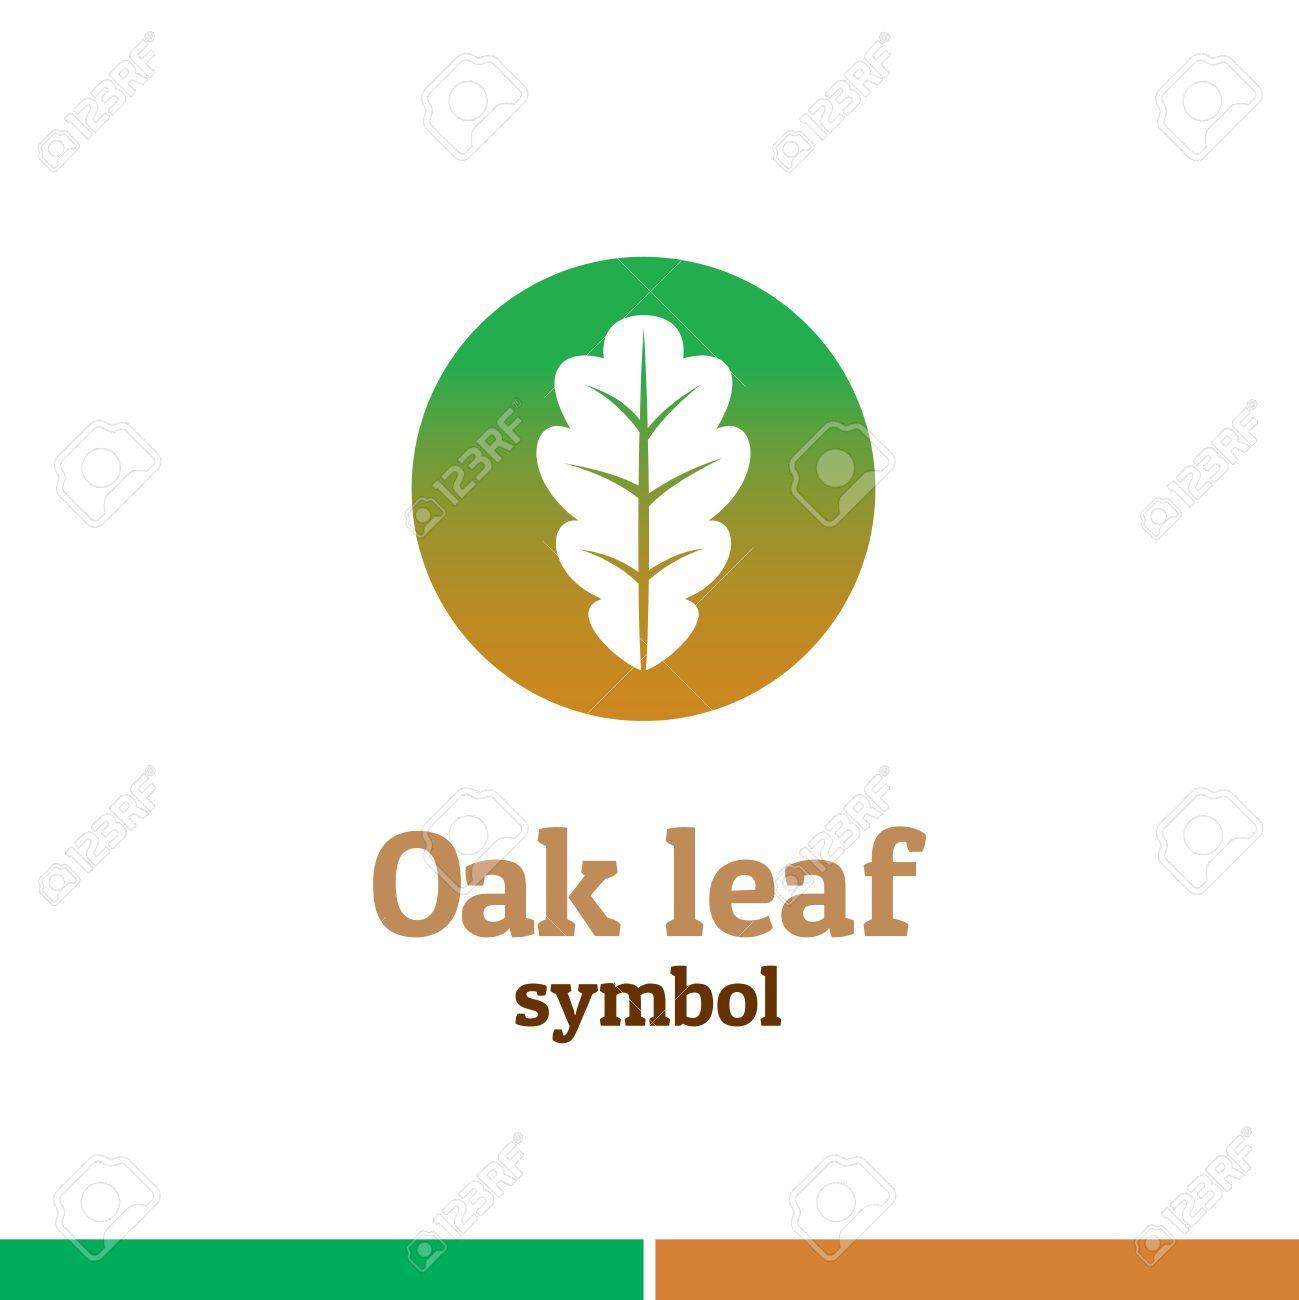 Oak leaf symbol logo nature theme template royalty free cliparts oak leaf symbol logo nature theme template stock vector 41640792 biocorpaavc Gallery